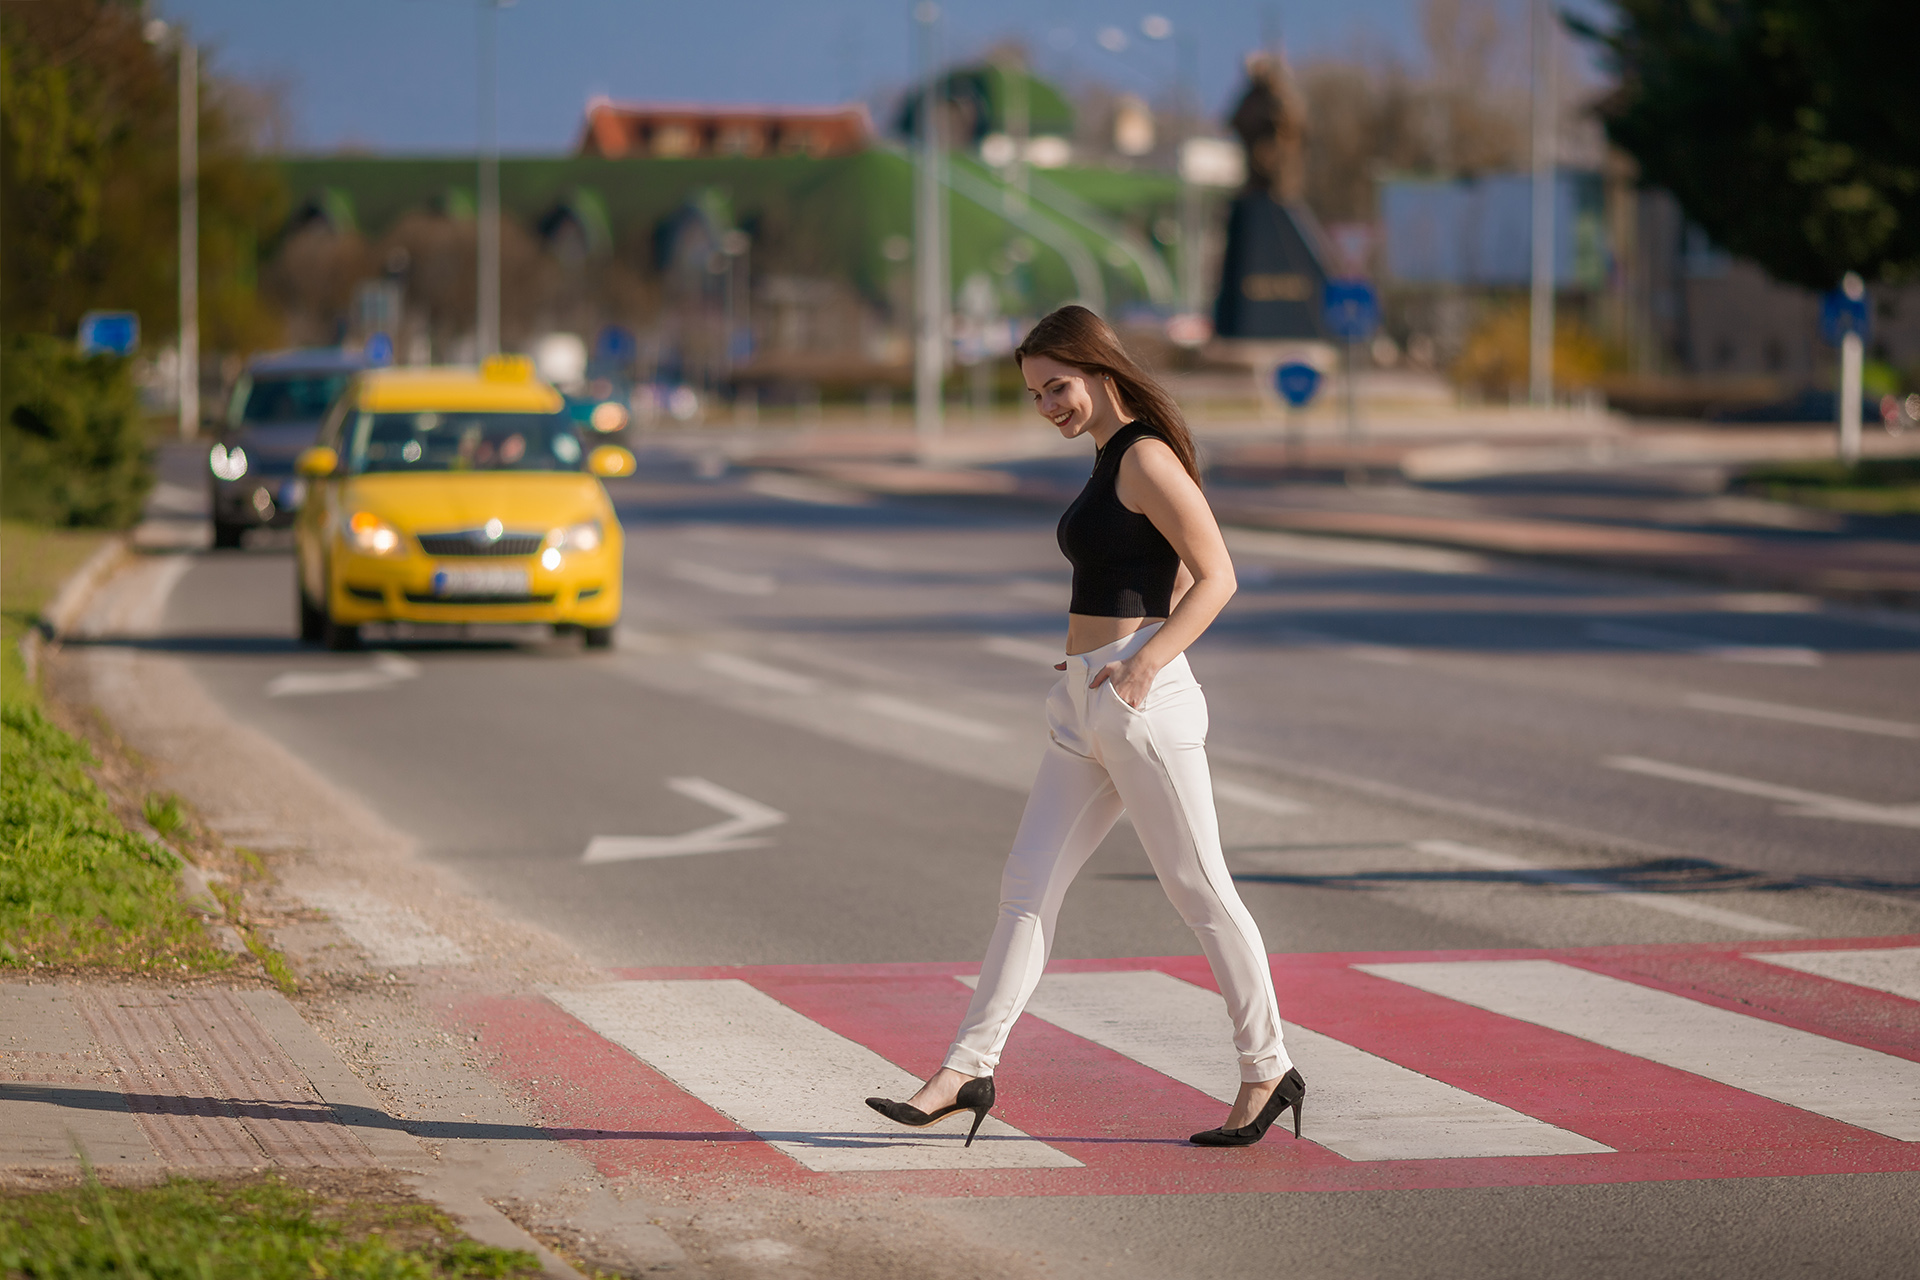 Ahoj/Szia cover girl Monika - Kristian Marko photography